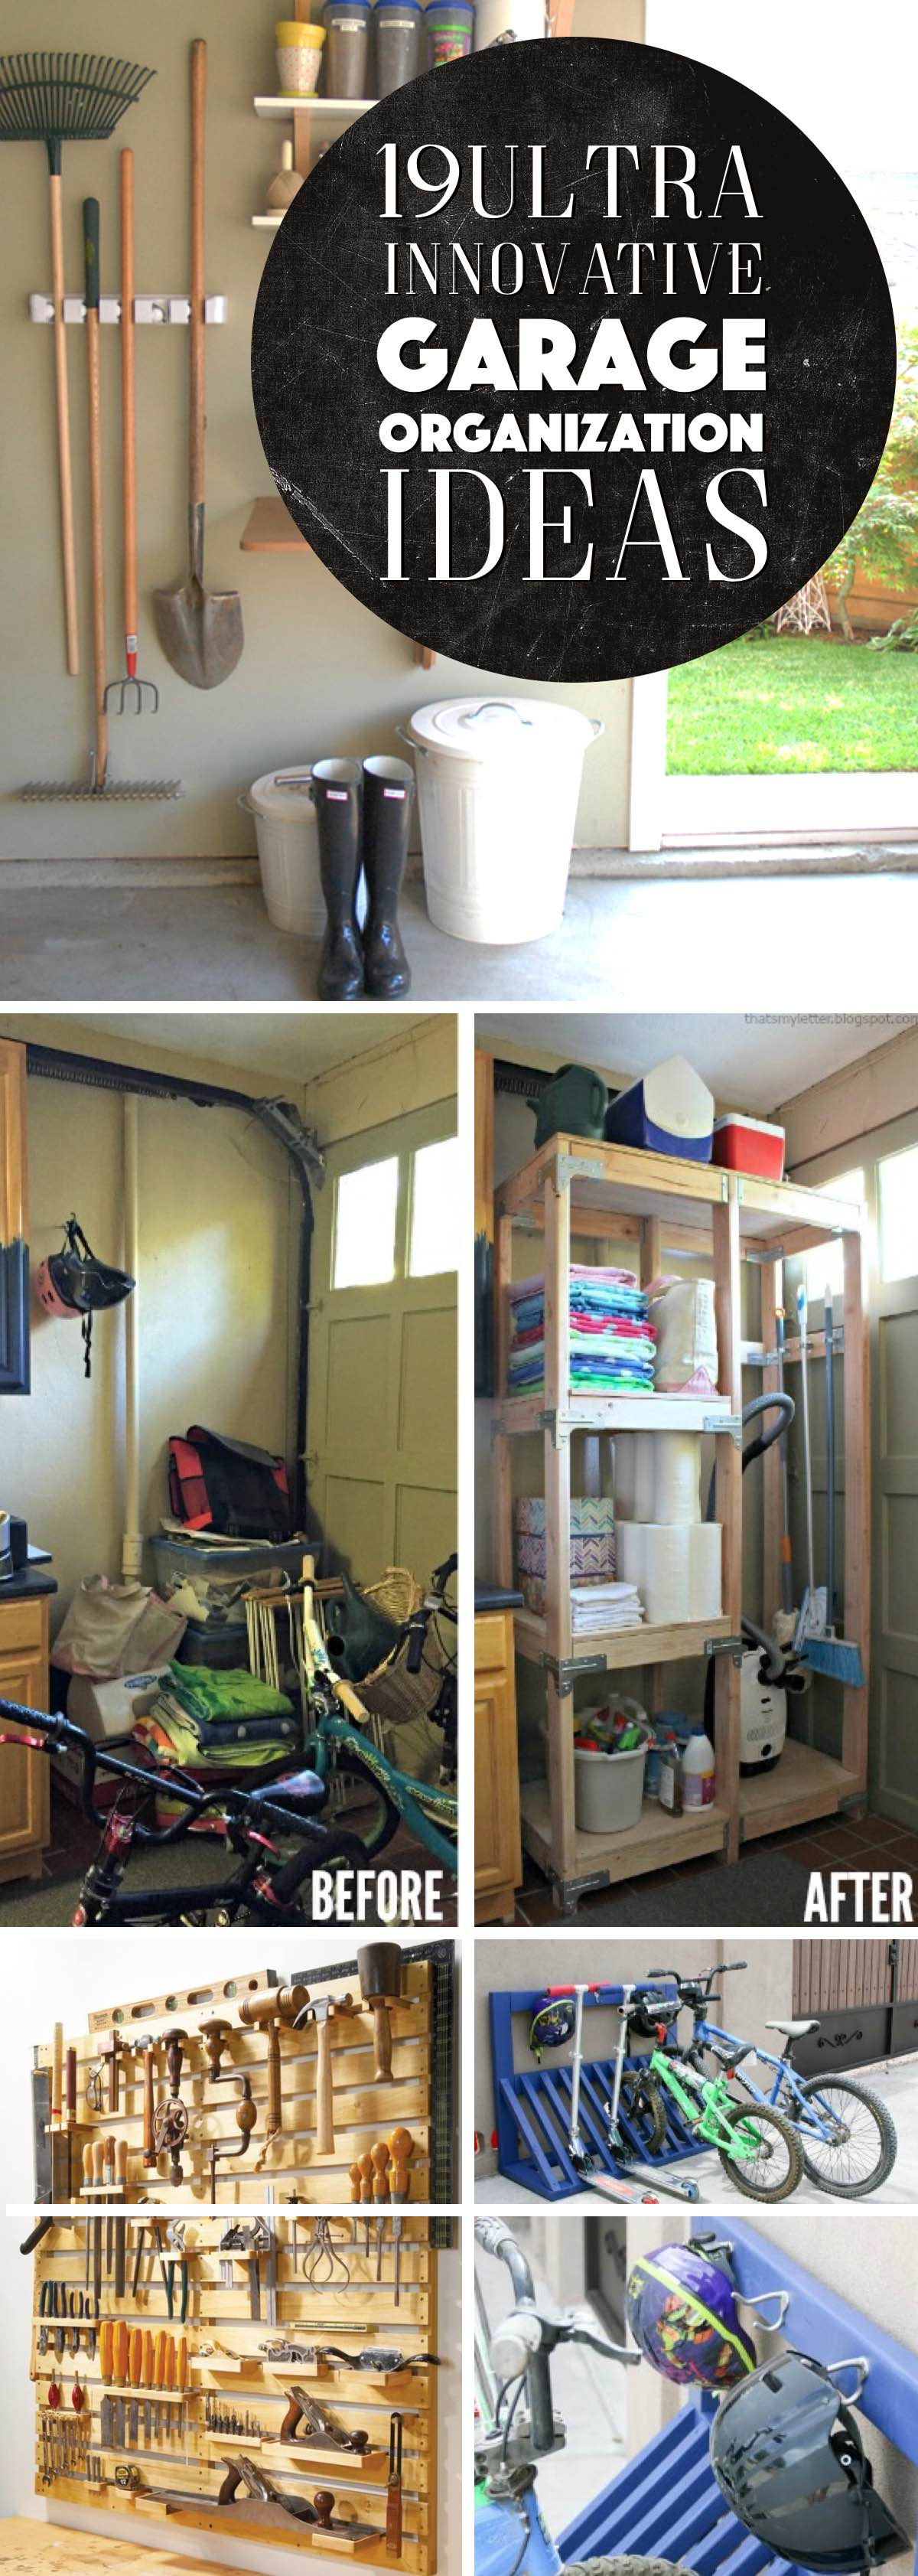 Ultra Innovative Garage Organization Ideas